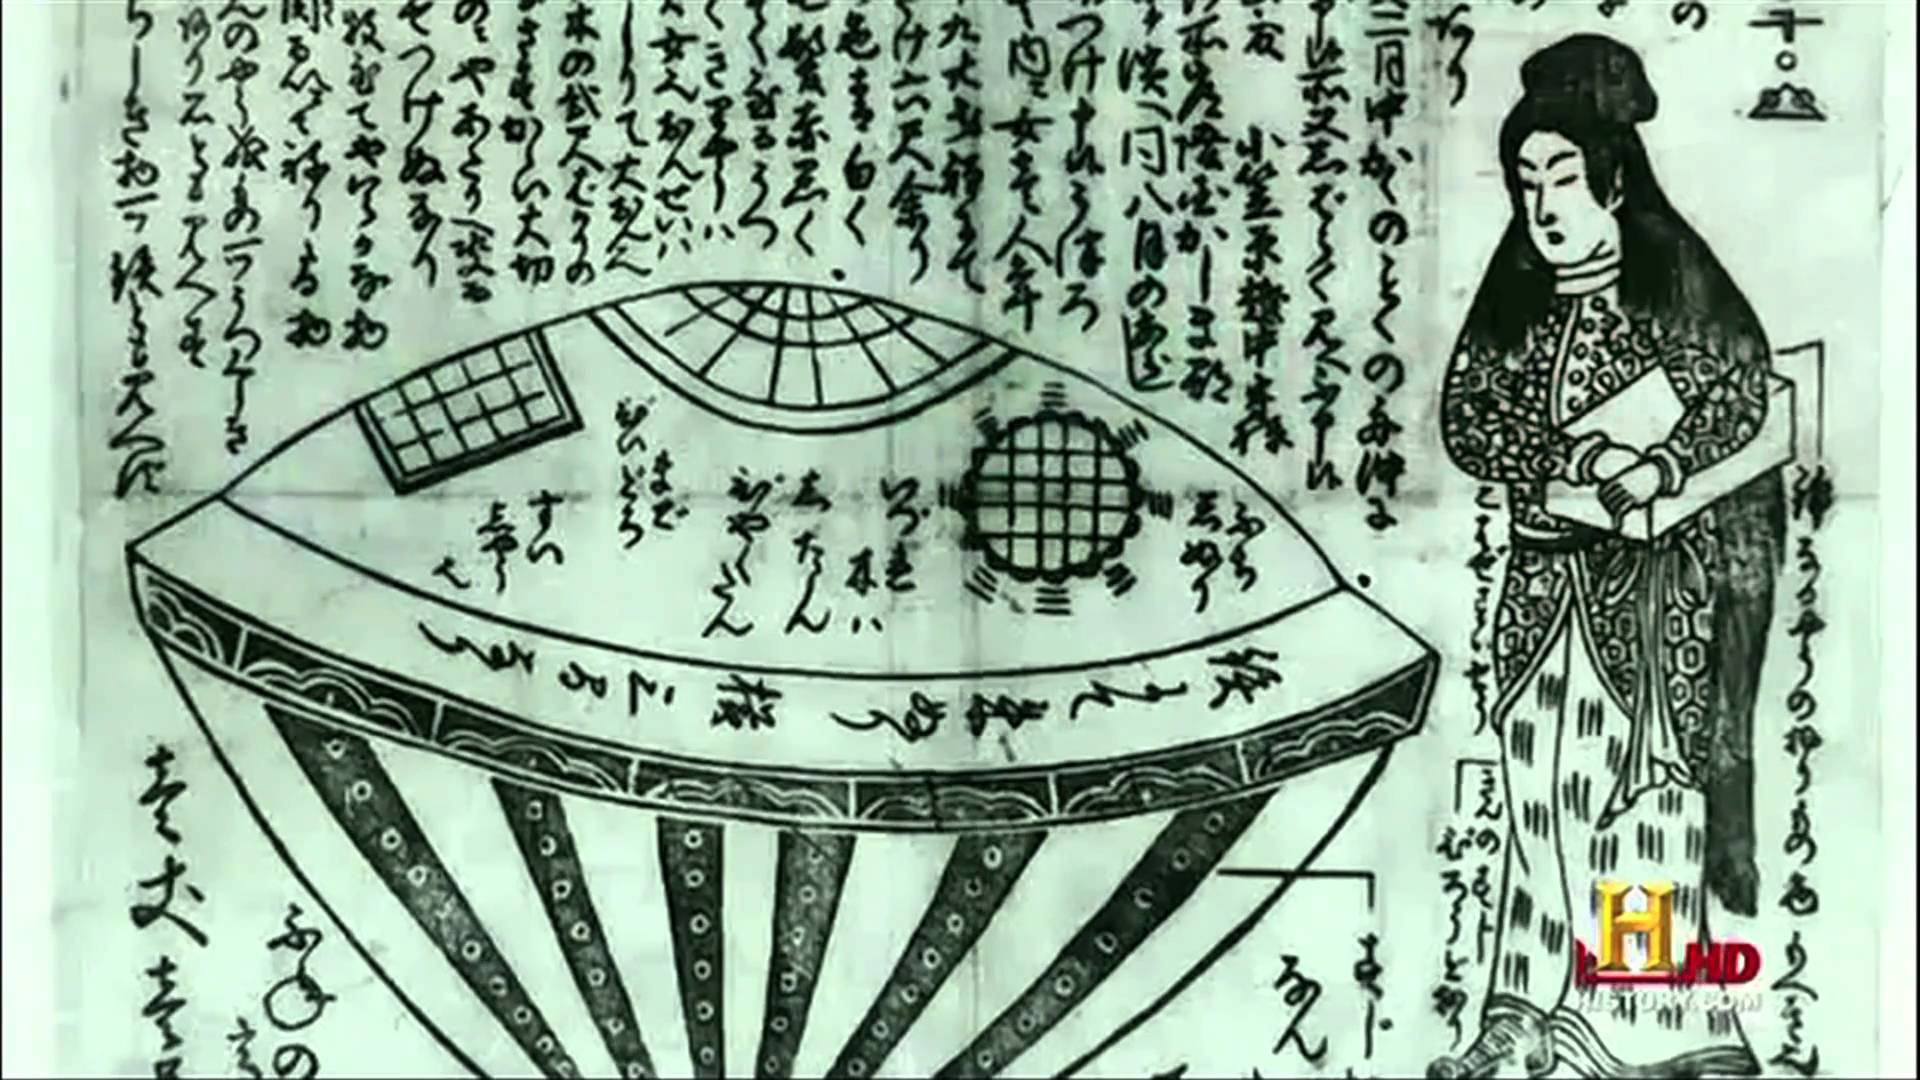 tsuro history - To no Cosmos